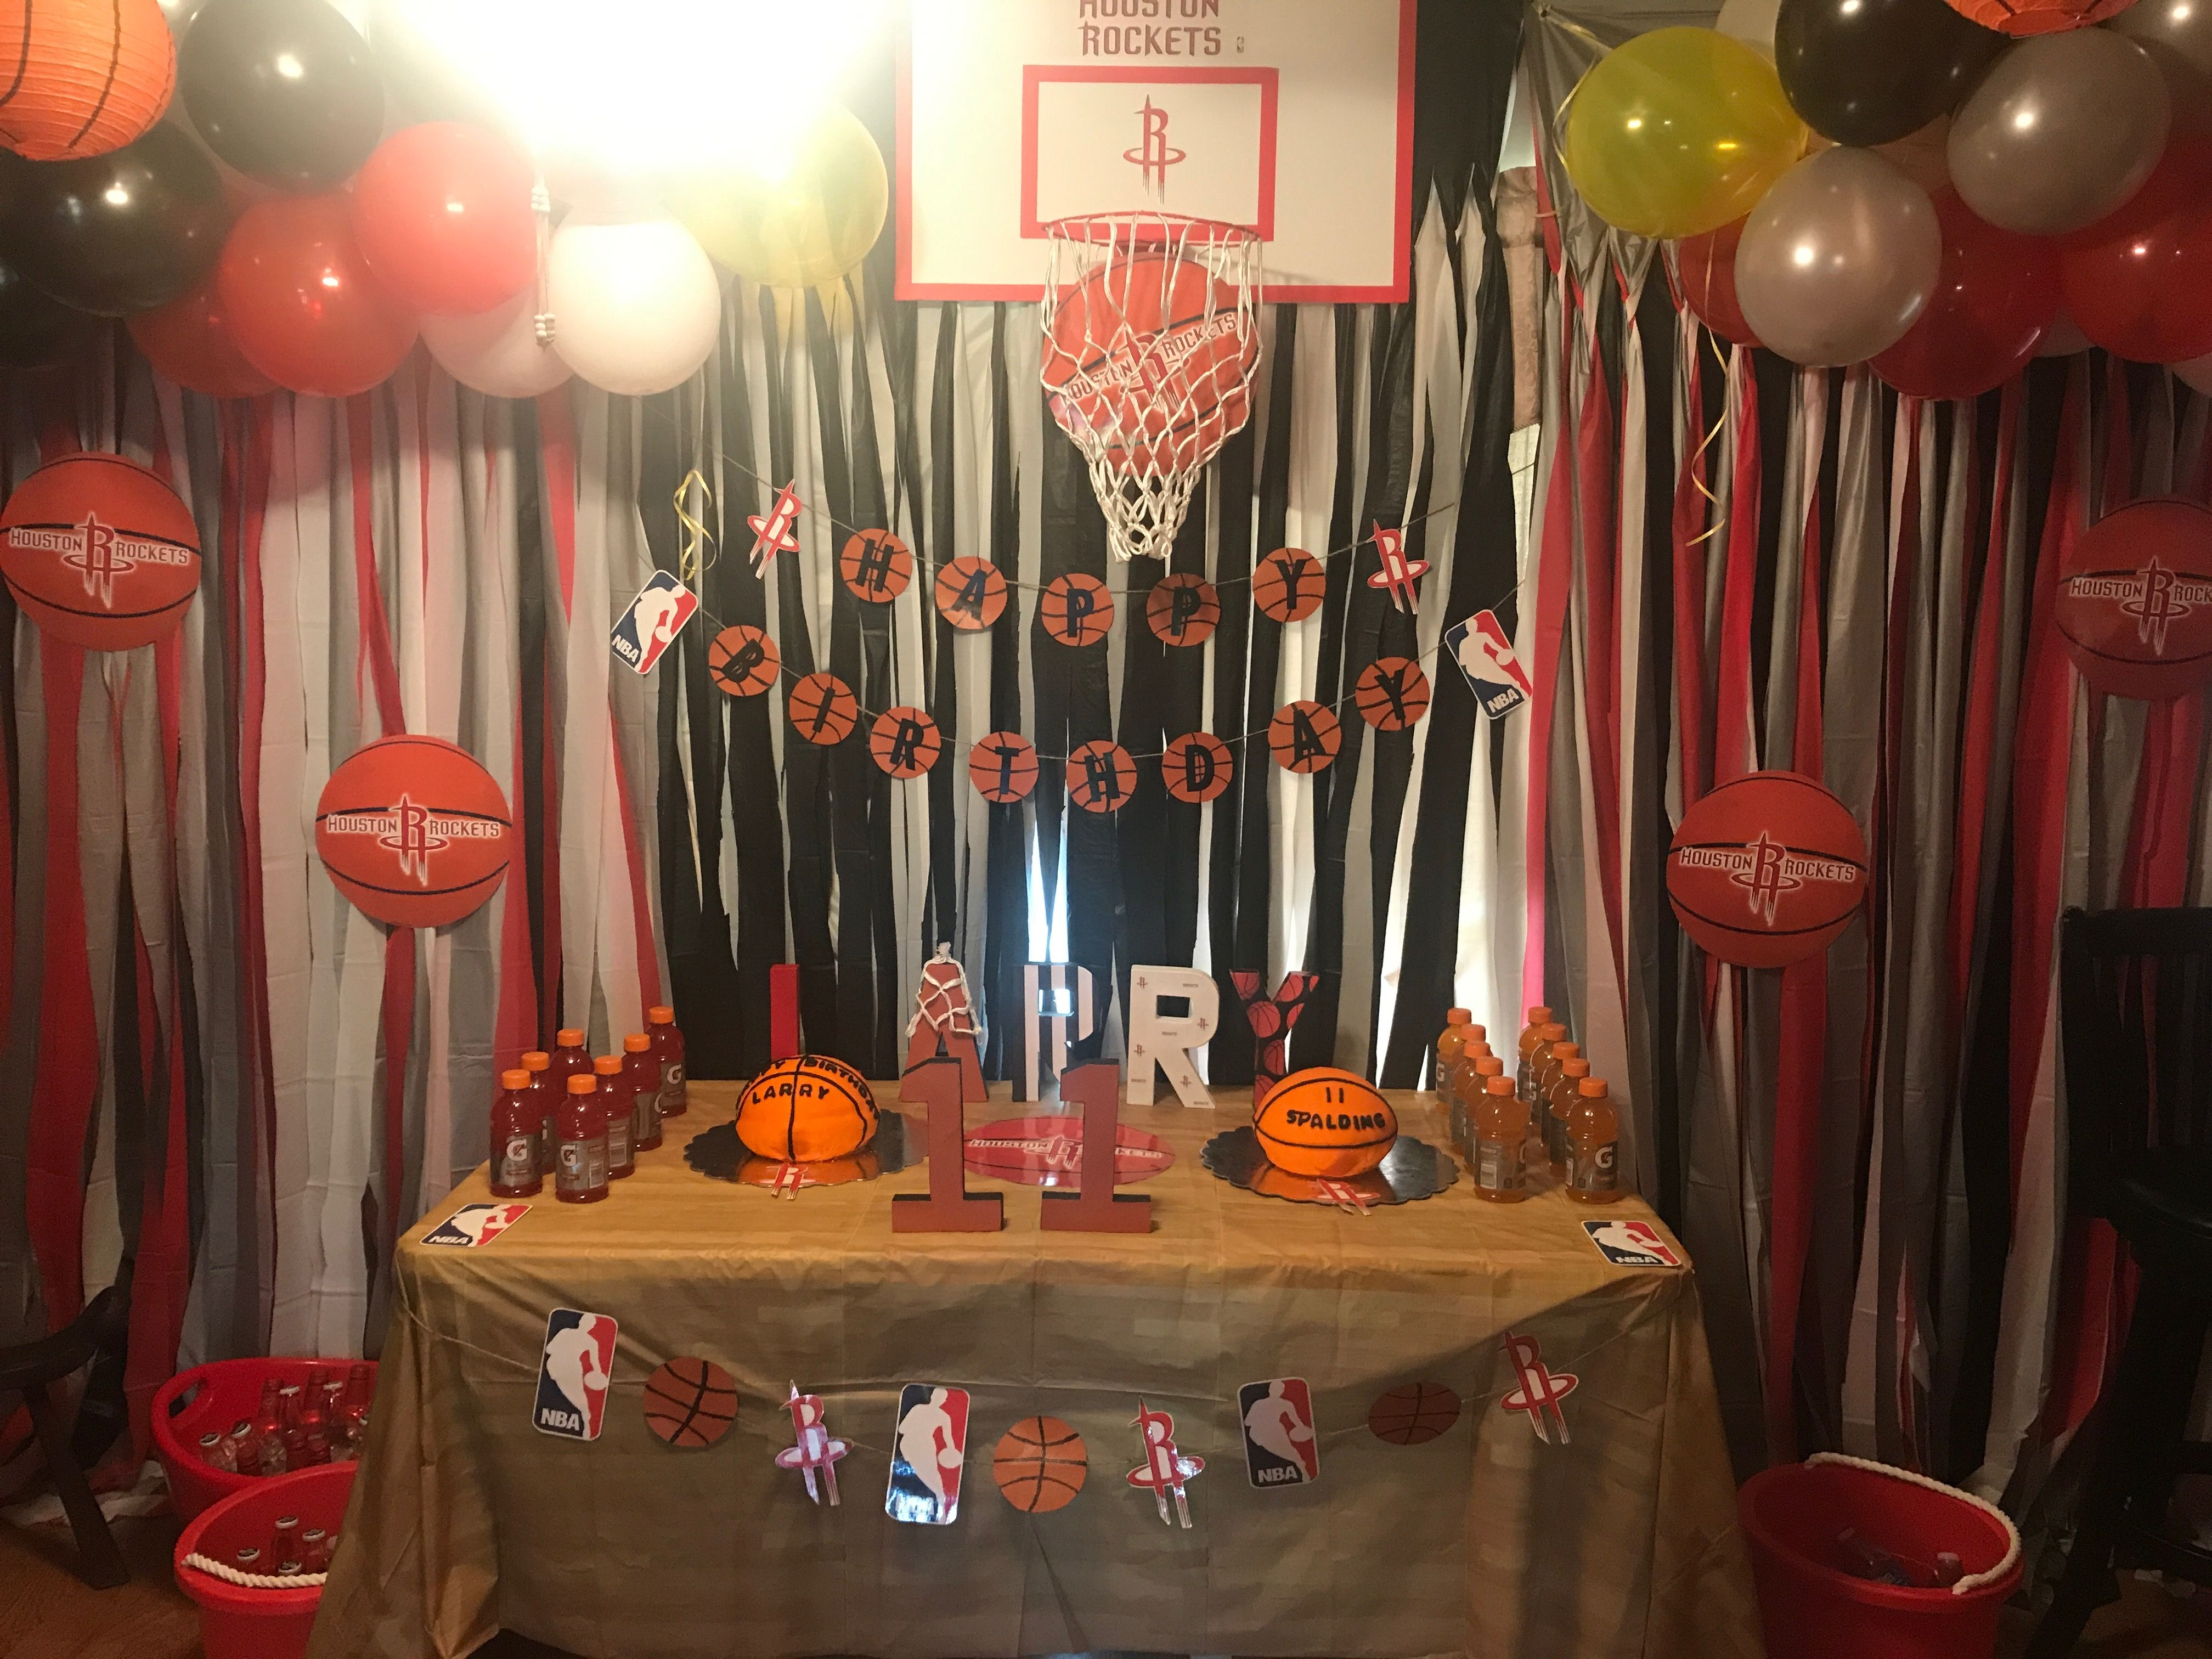 Houston Rockets Basketball Theme Birthday Party